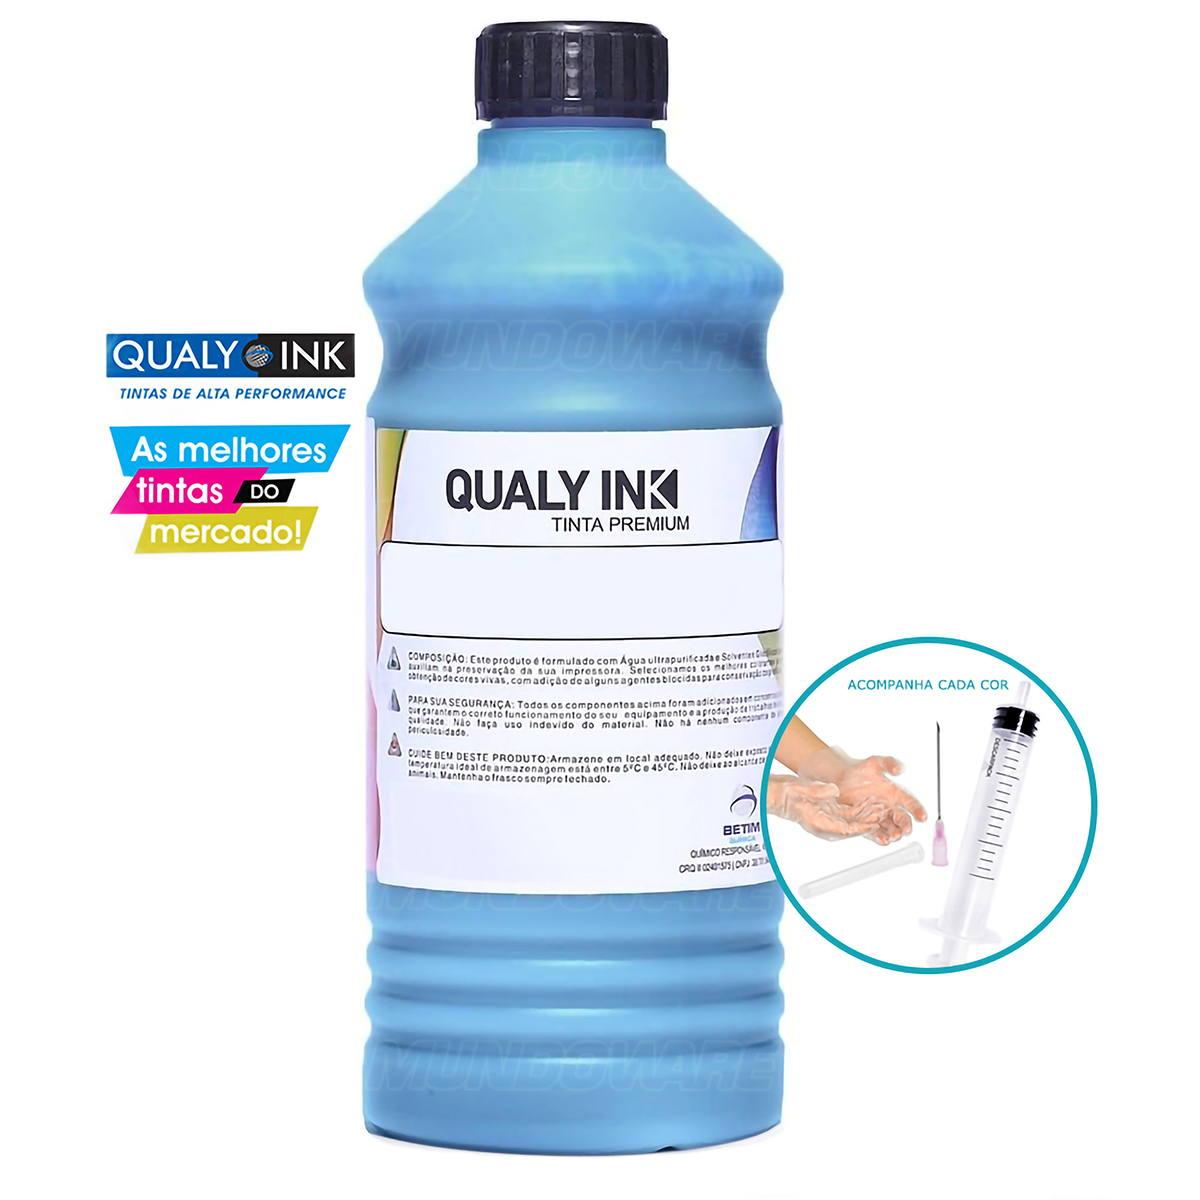 Compatível: Tinta Corante Qualy-Ink CC3H-1182 para HP Pro 8620 8100 8500 7110 8610 251dw 276dw Ciano Refil 1L